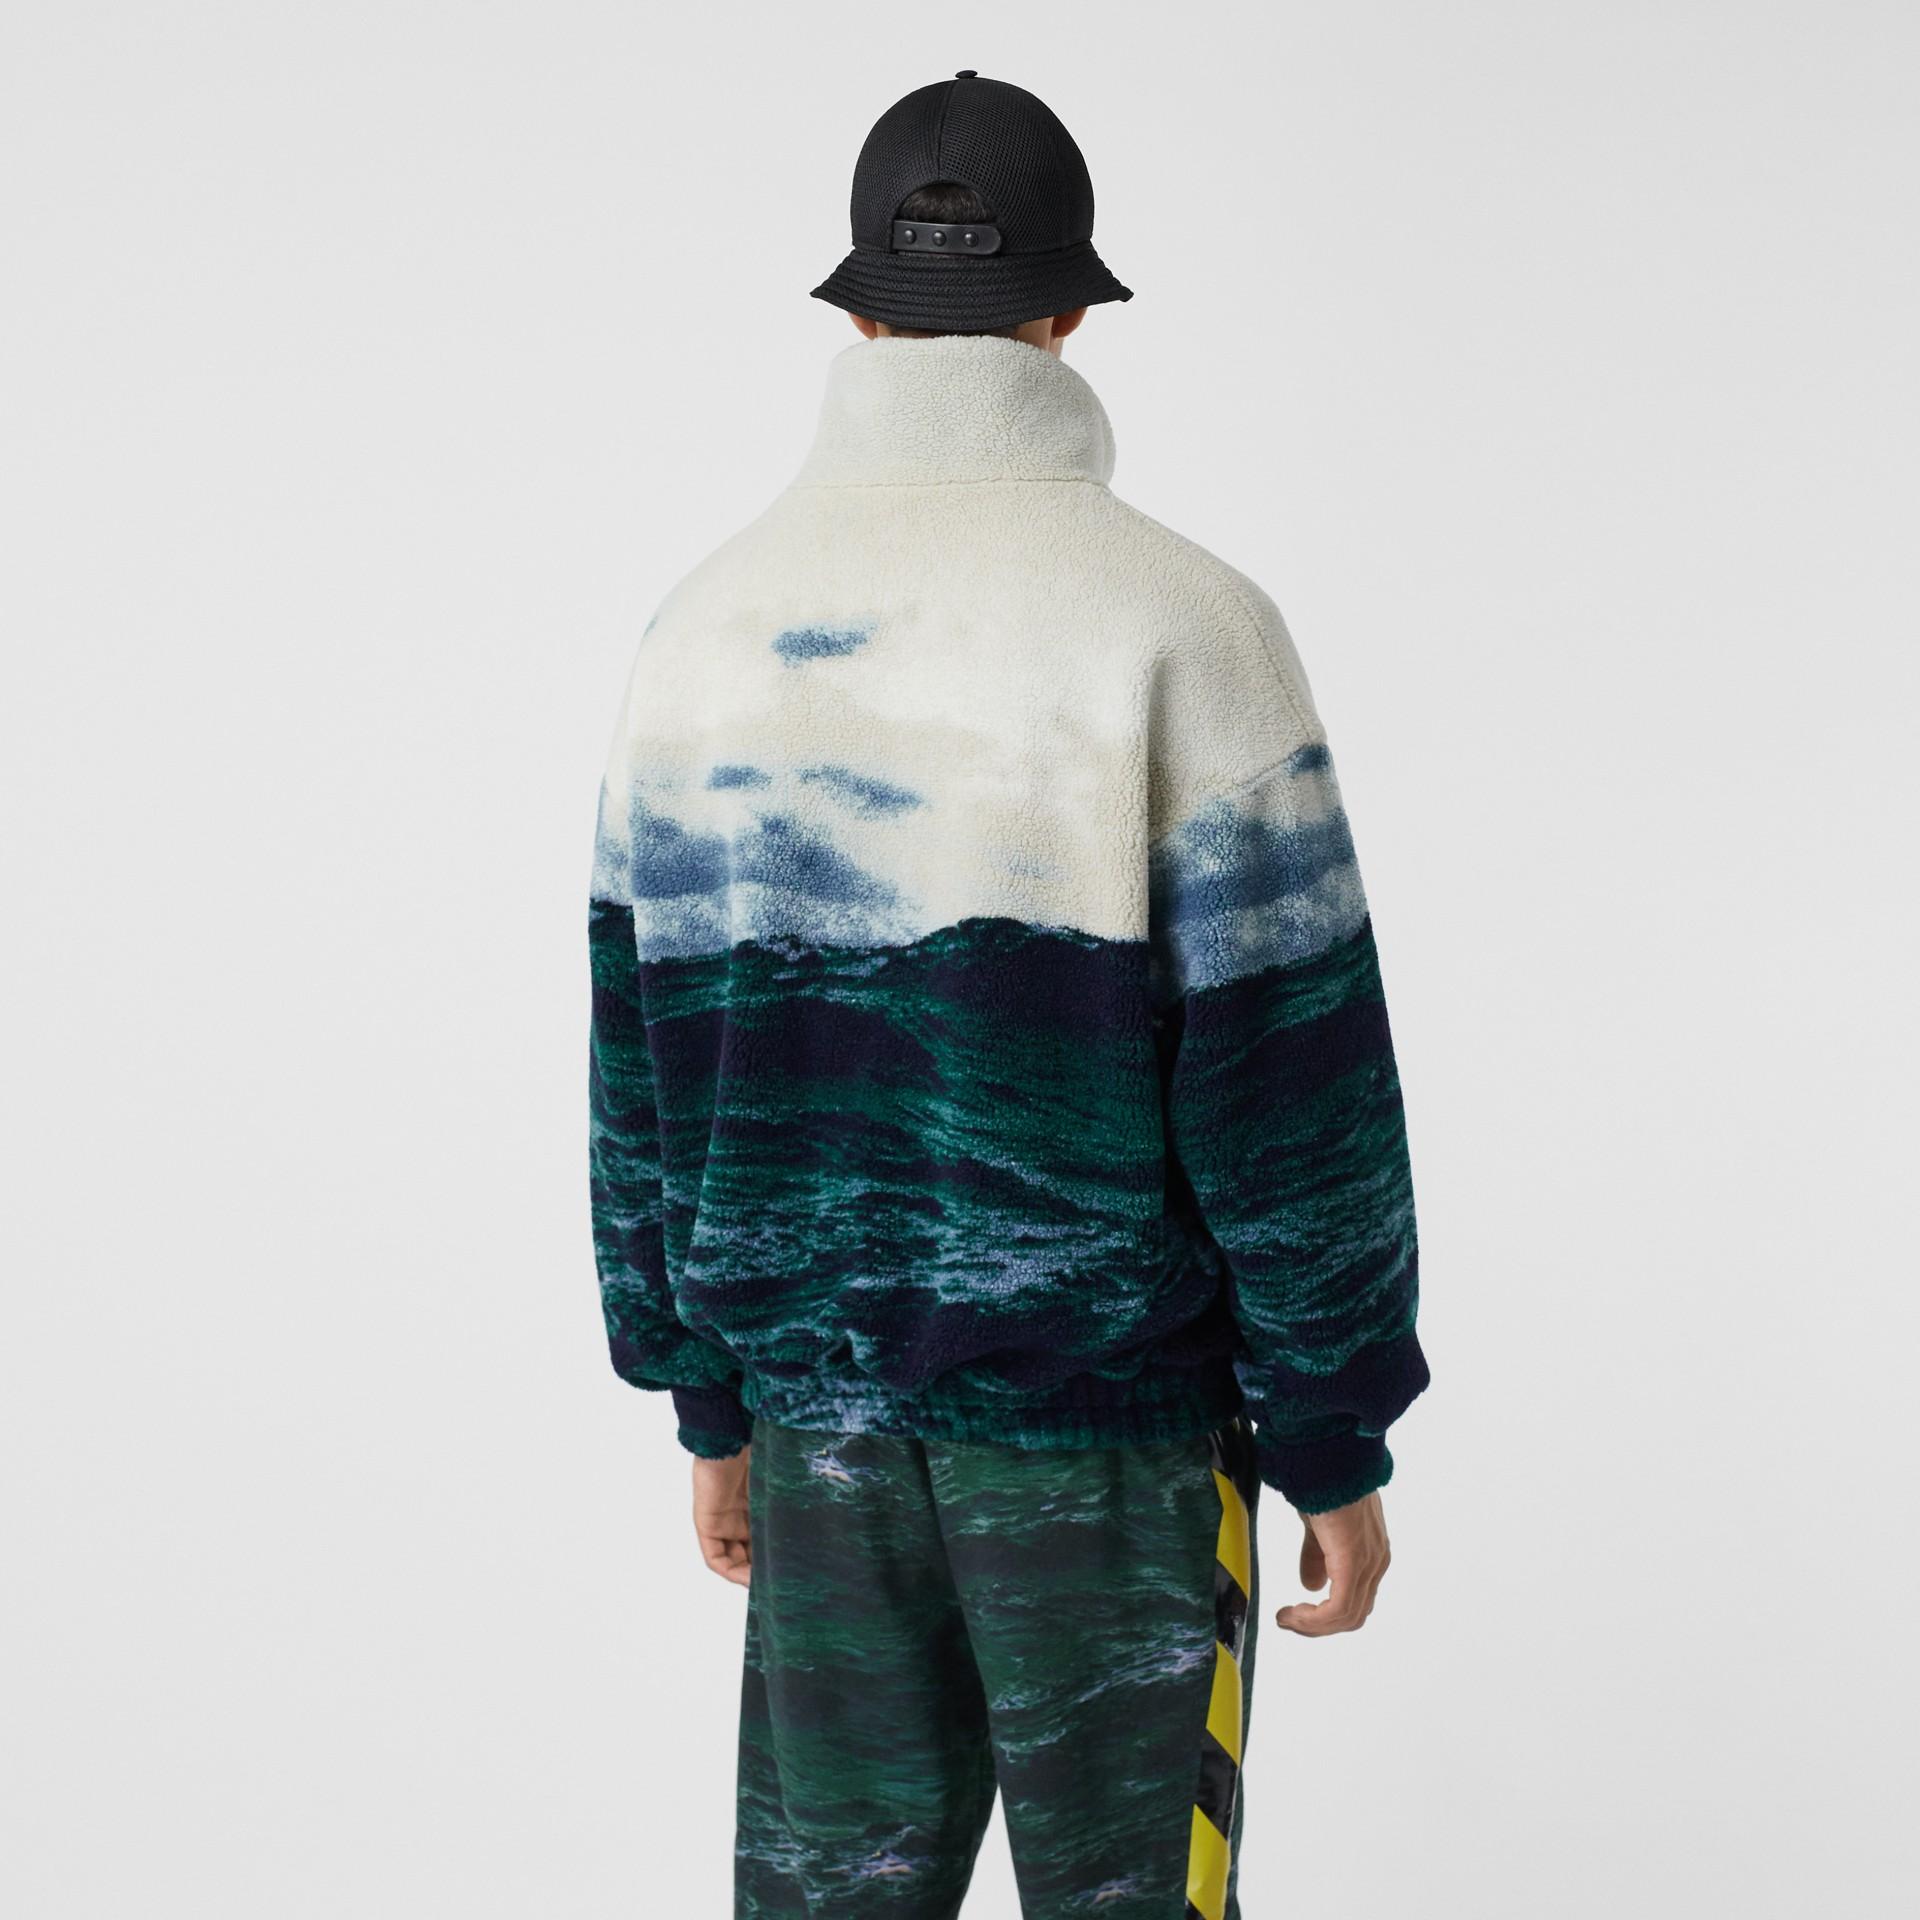 Sea Print Fleece Jacket with Detachable Warmer in Deep Teal - Men | Burberry - gallery image 2